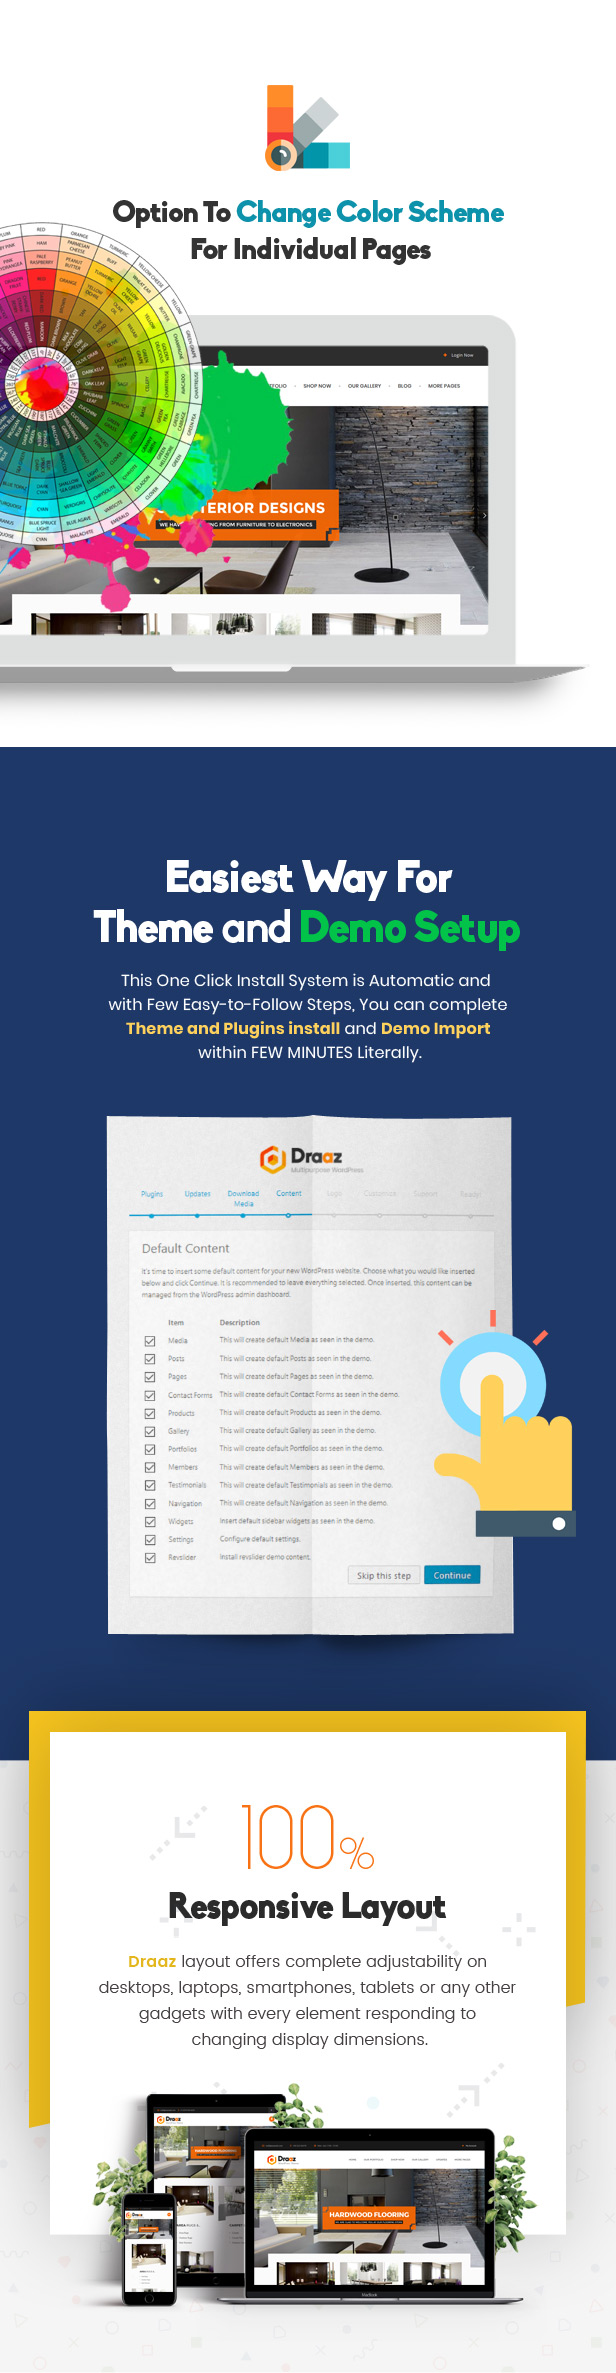 Draaz - Cryptocurrency and Flooring Multipurpose Business WordPress Theme - 4